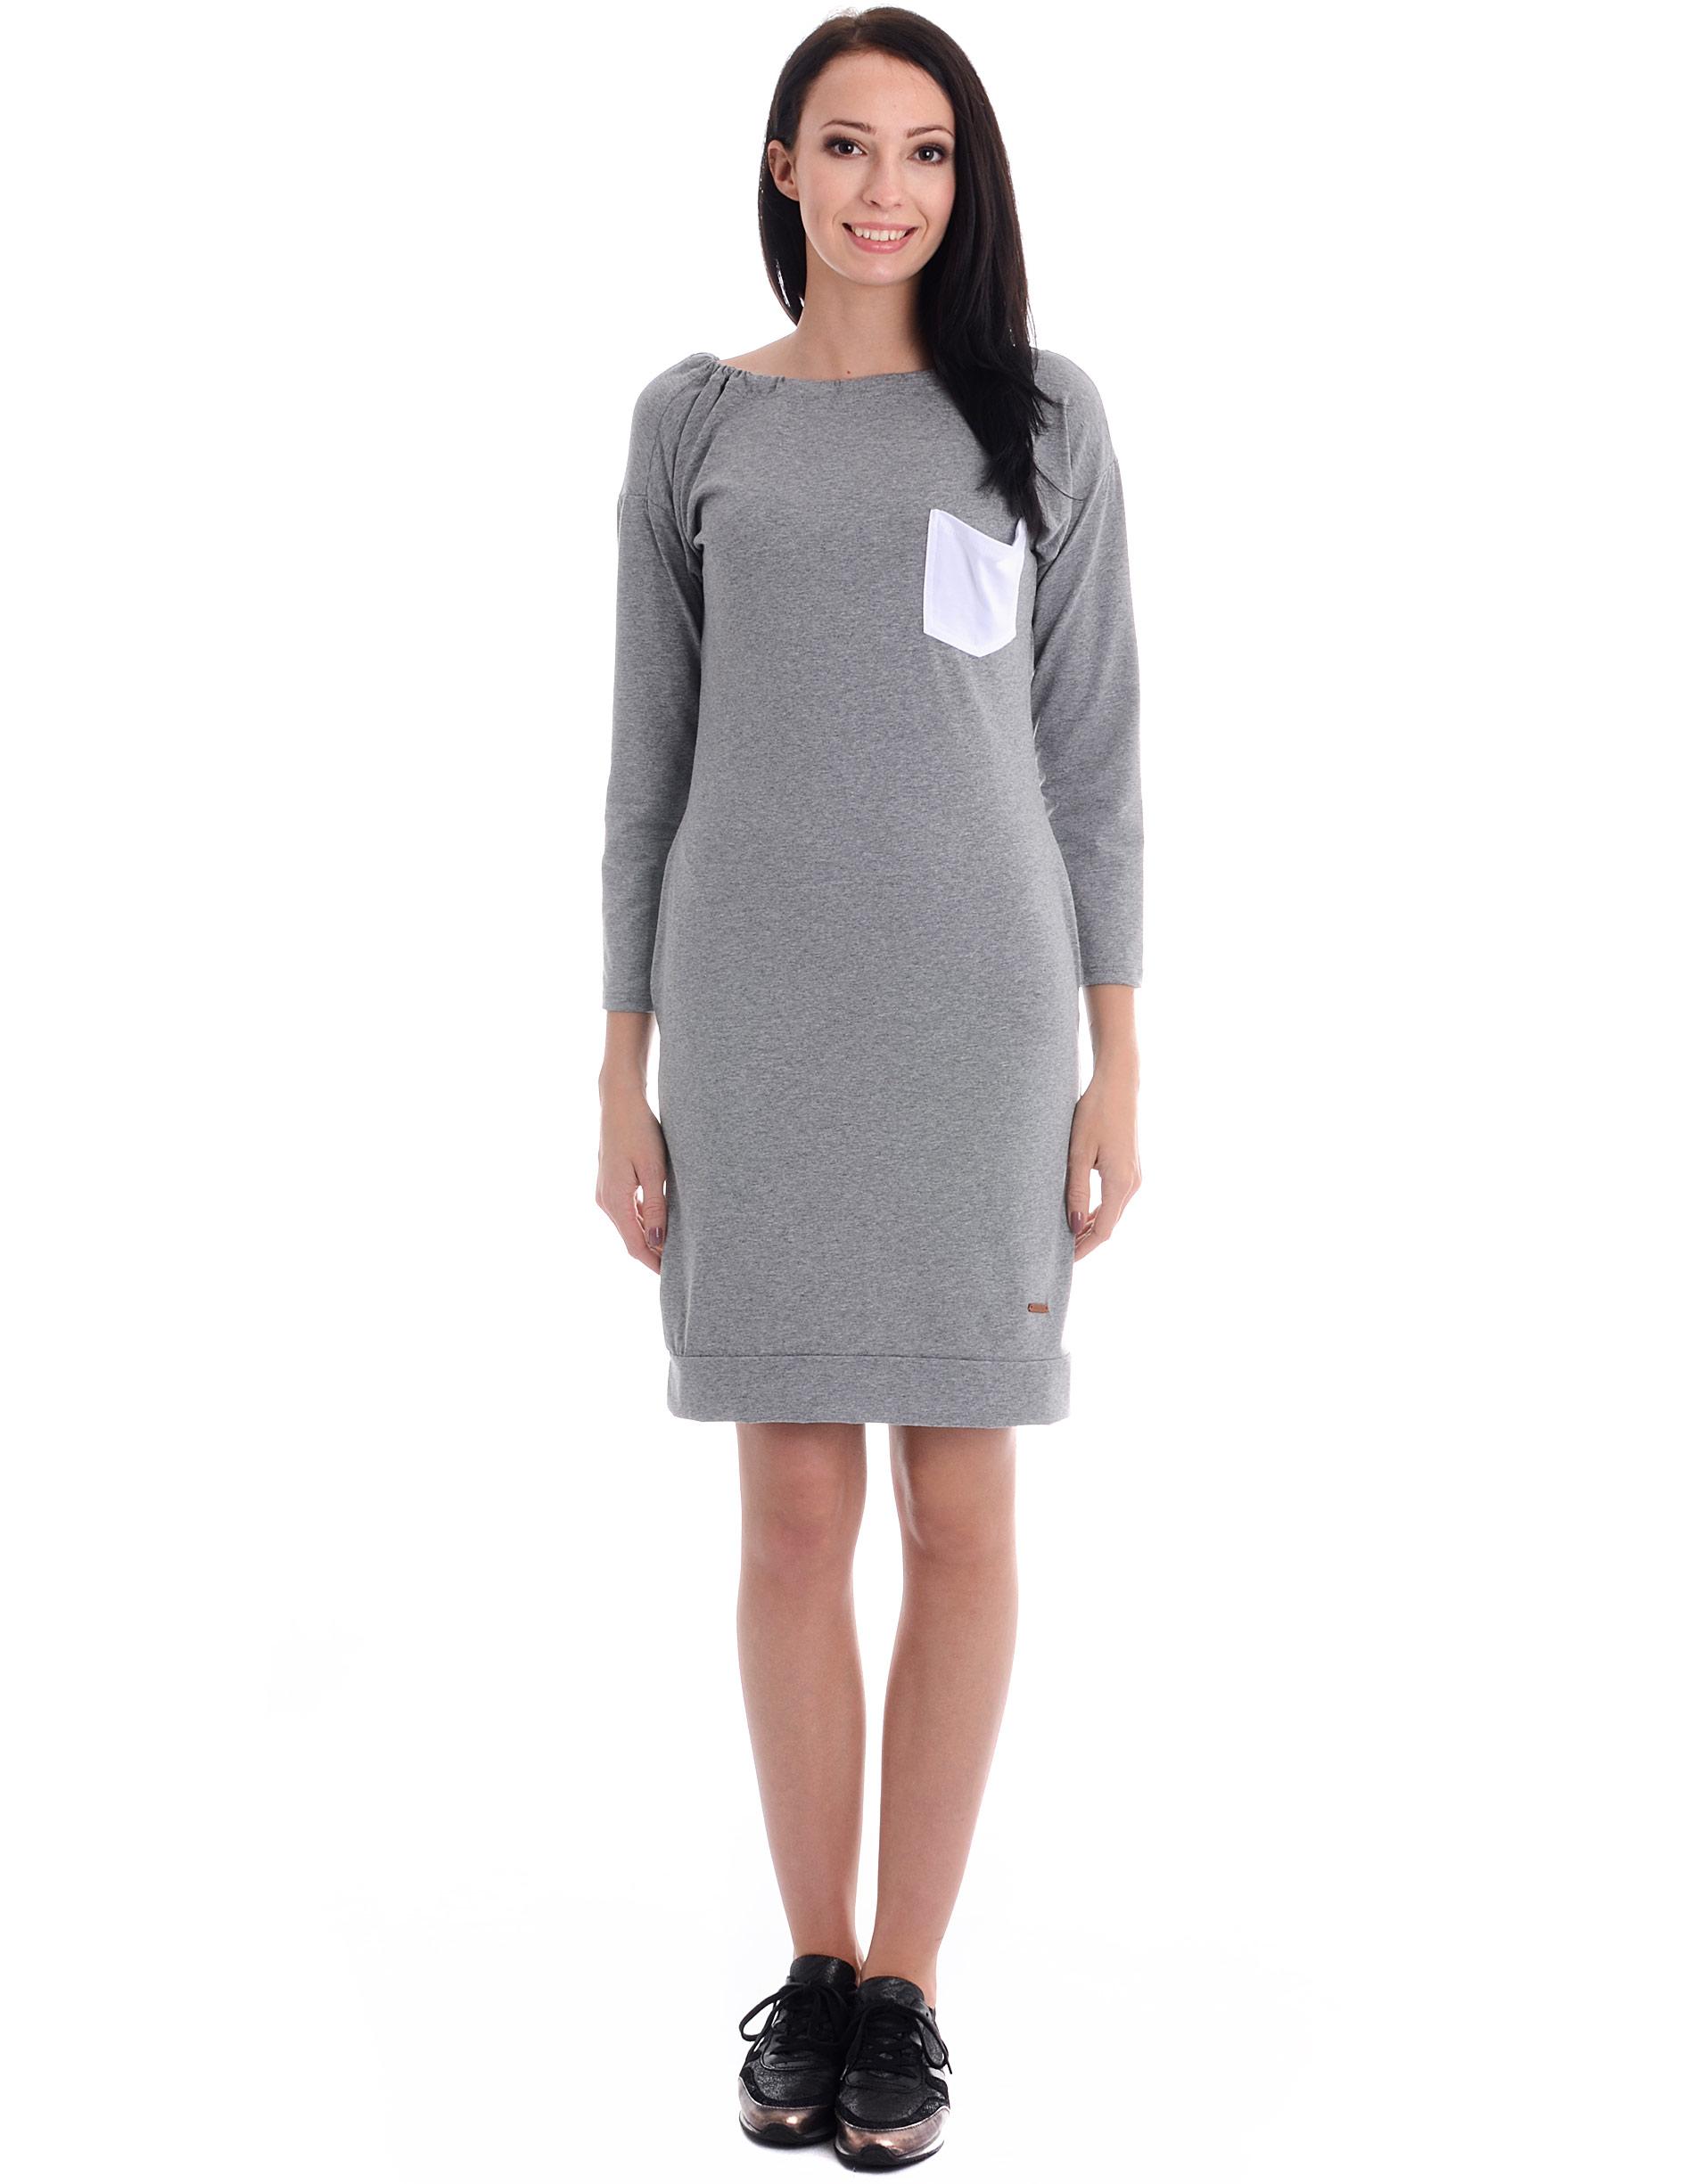 Sukienka - 30-84478 GMED - Unisono